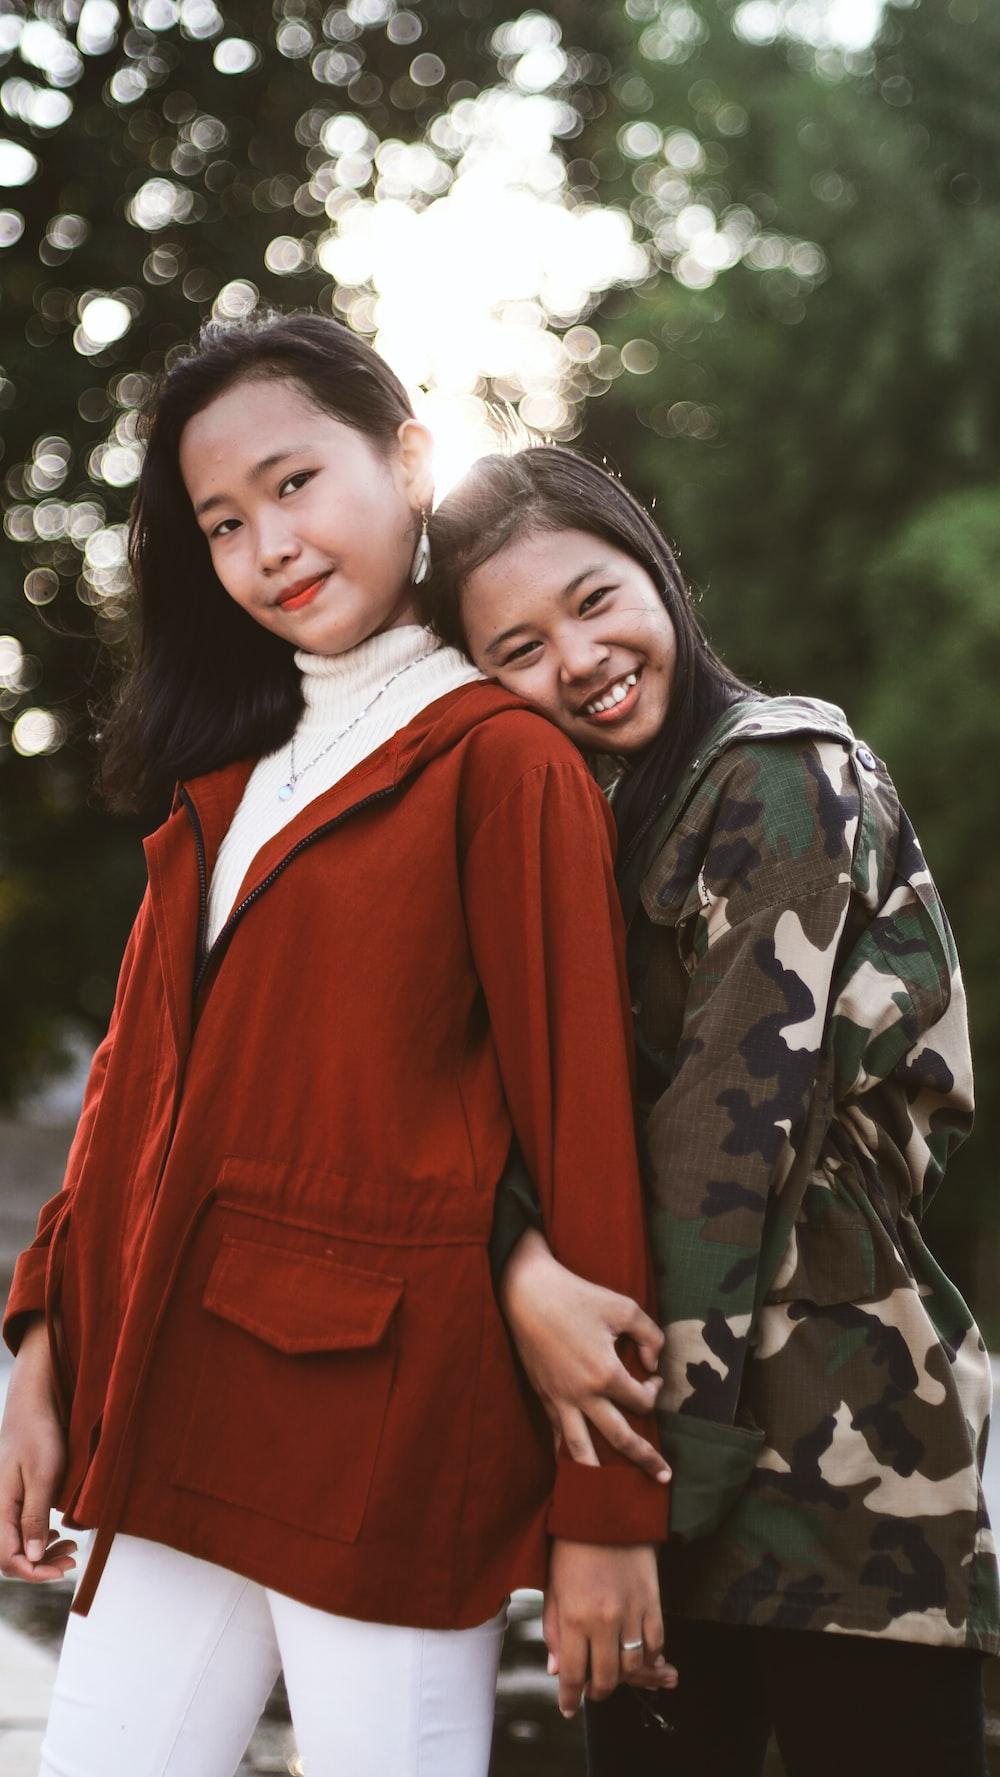 two woman wearing jackets